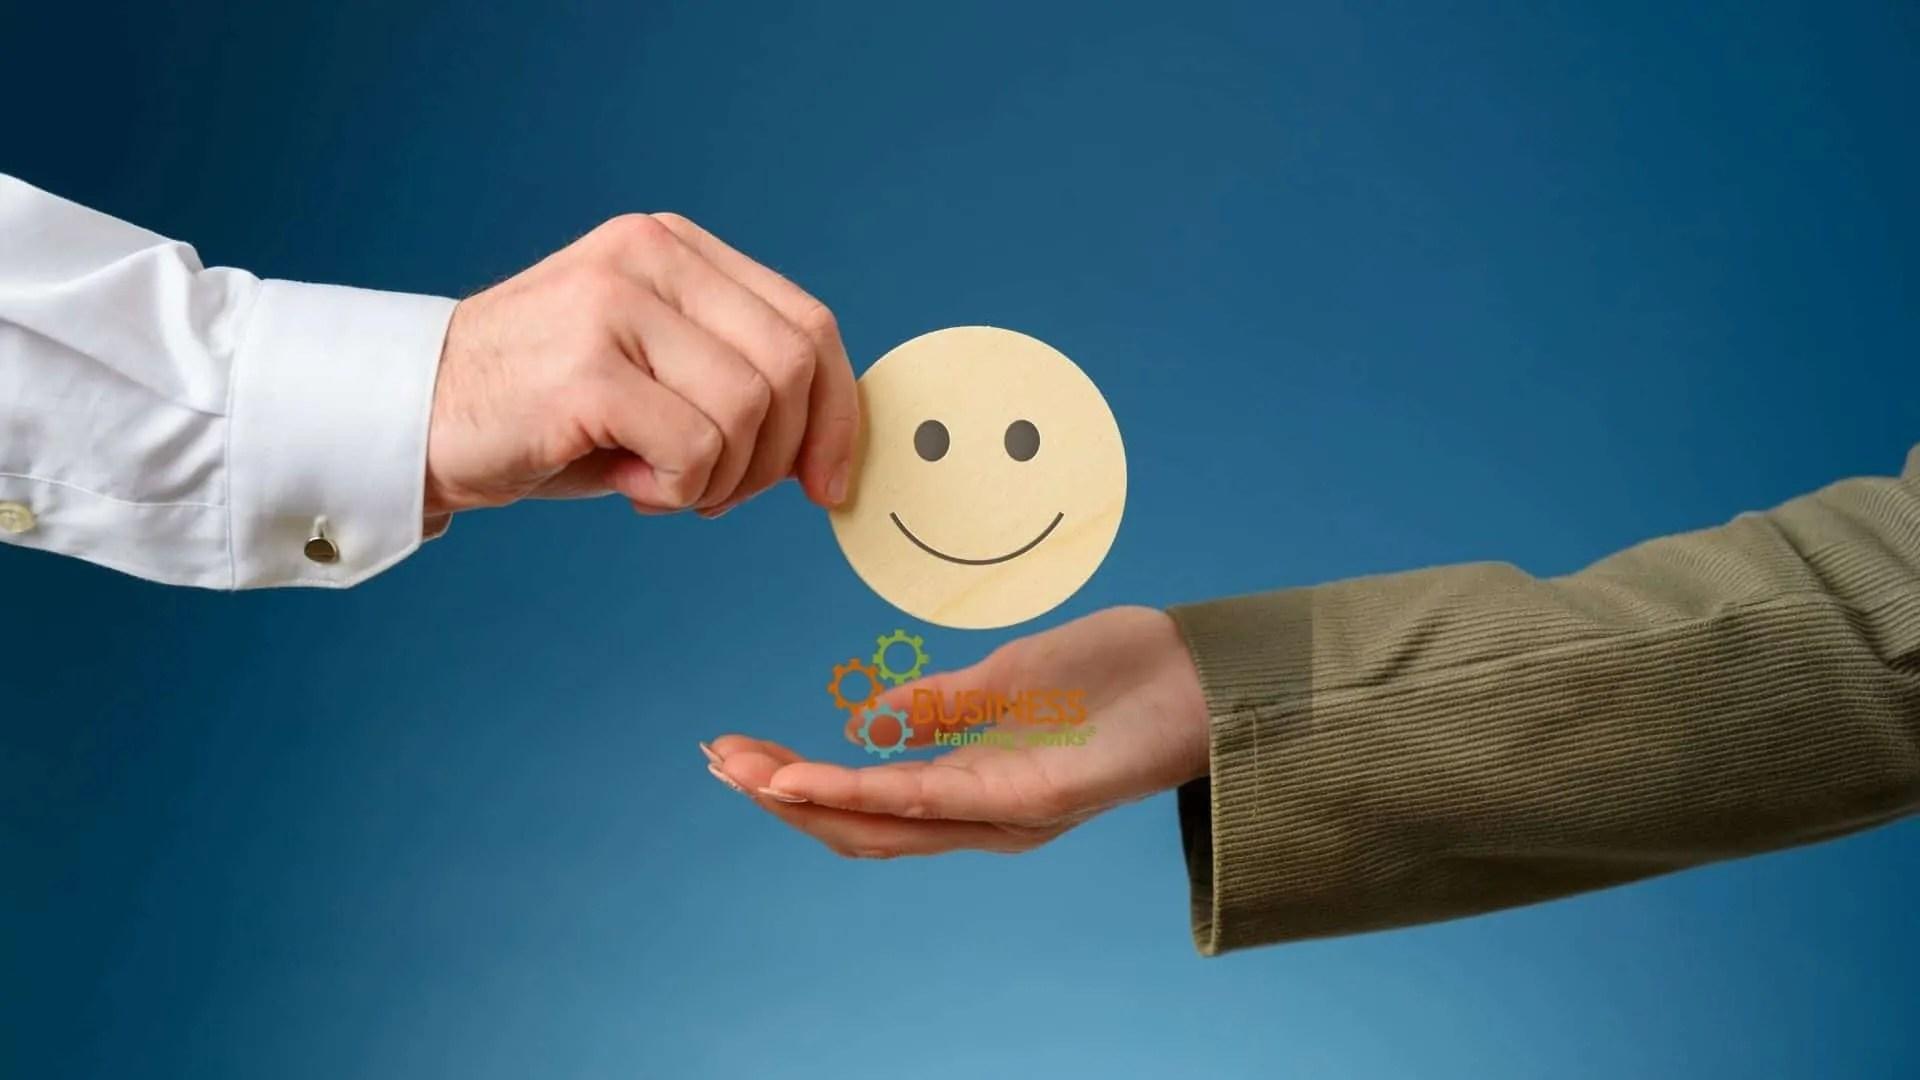 Web-Based Customer Service Training